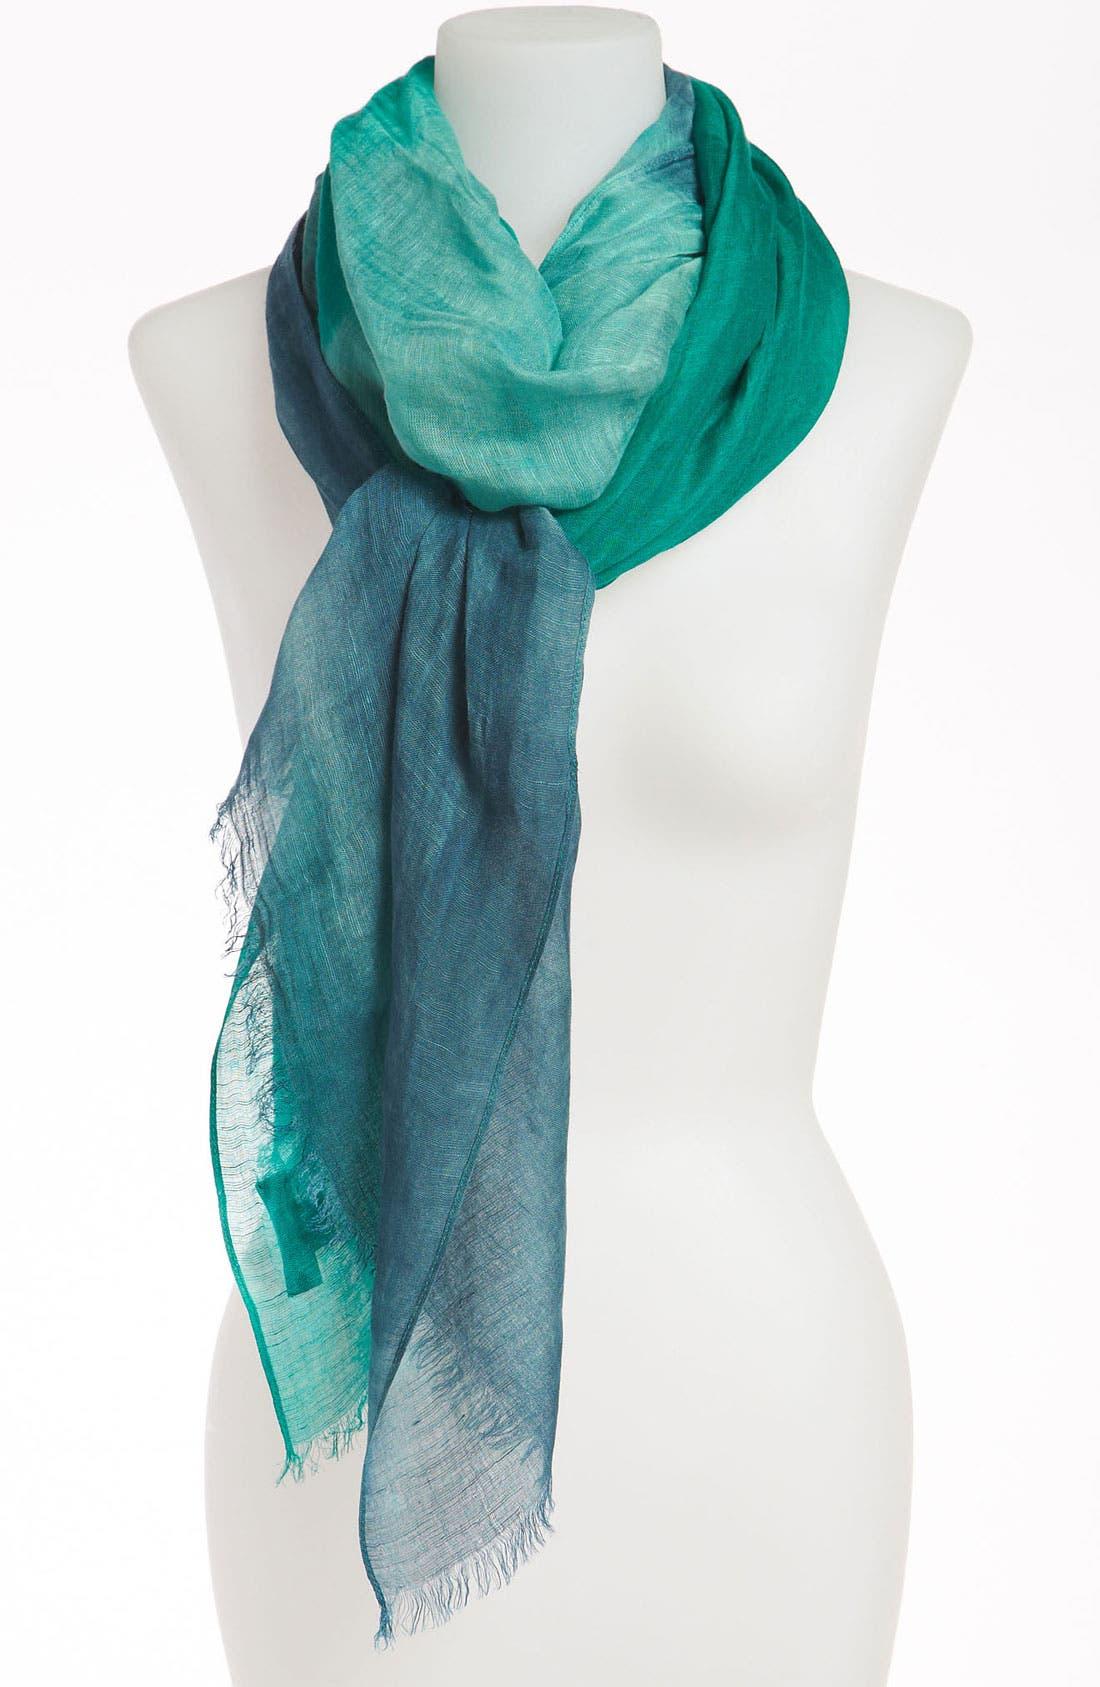 Alternate Image 1 Selected - Sonia Rykiel 'Tricolor' Linen Blend Stole